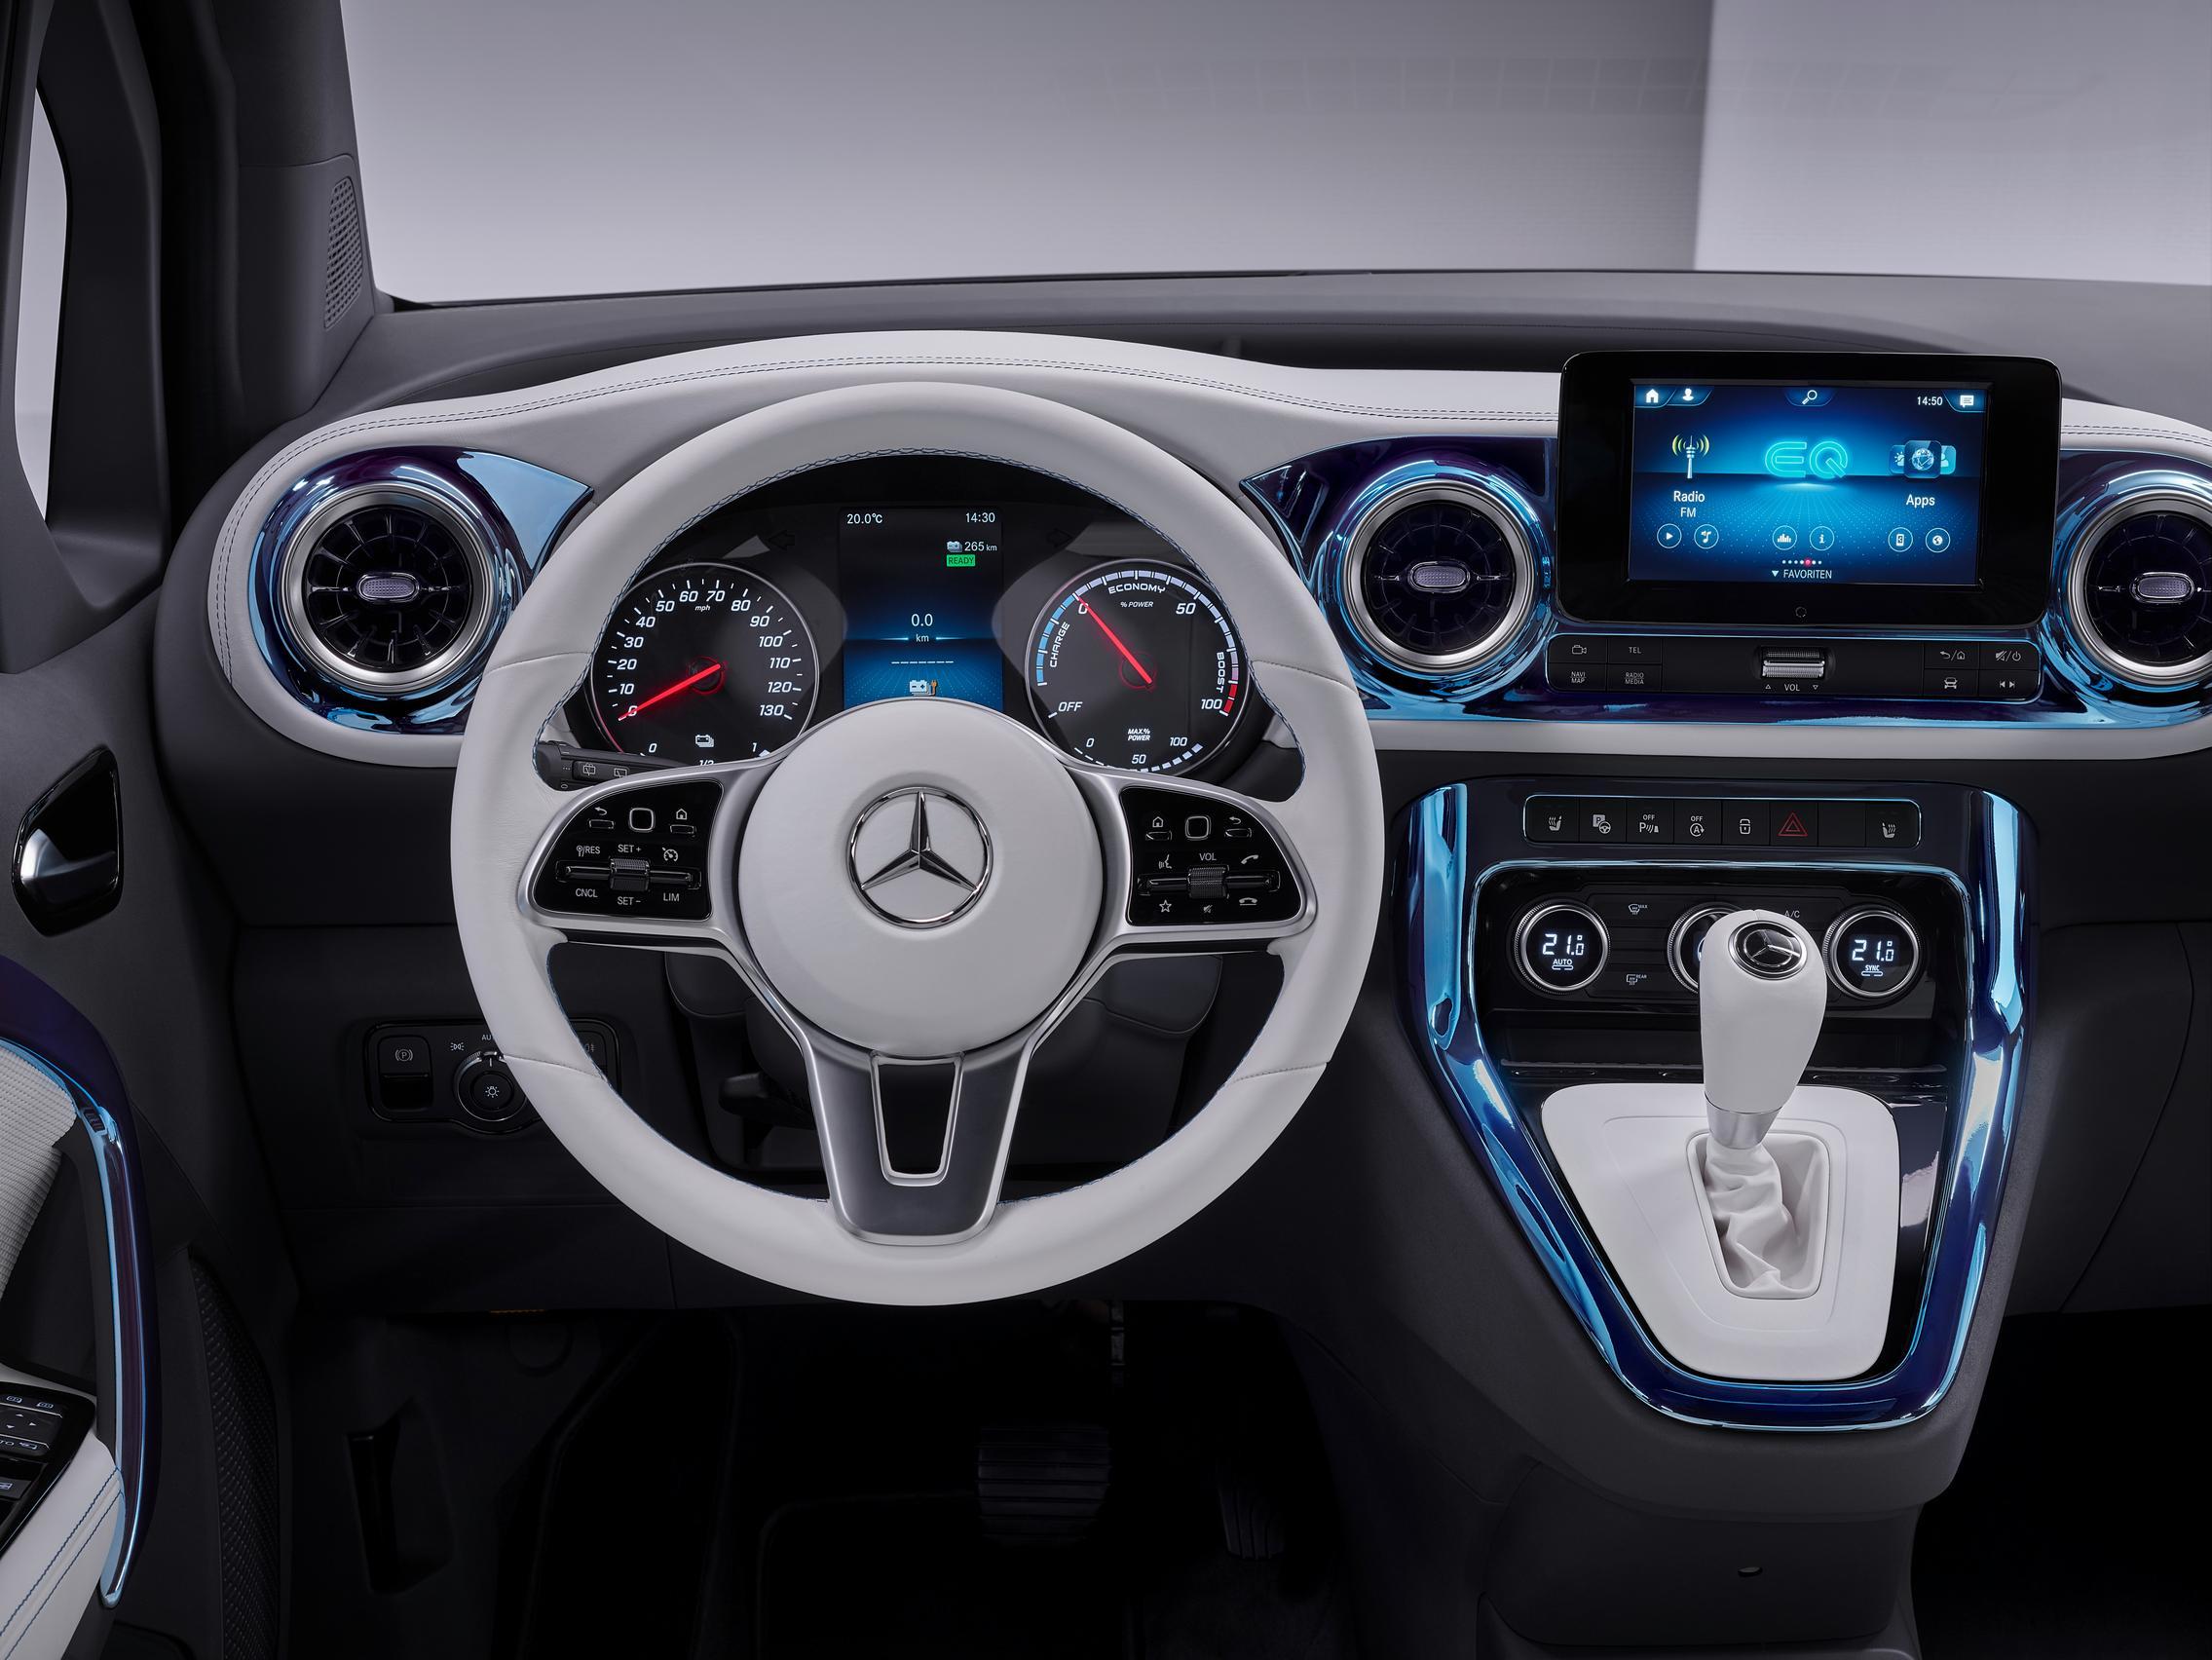 2022 Mercedes-Benz EQT steering wheel